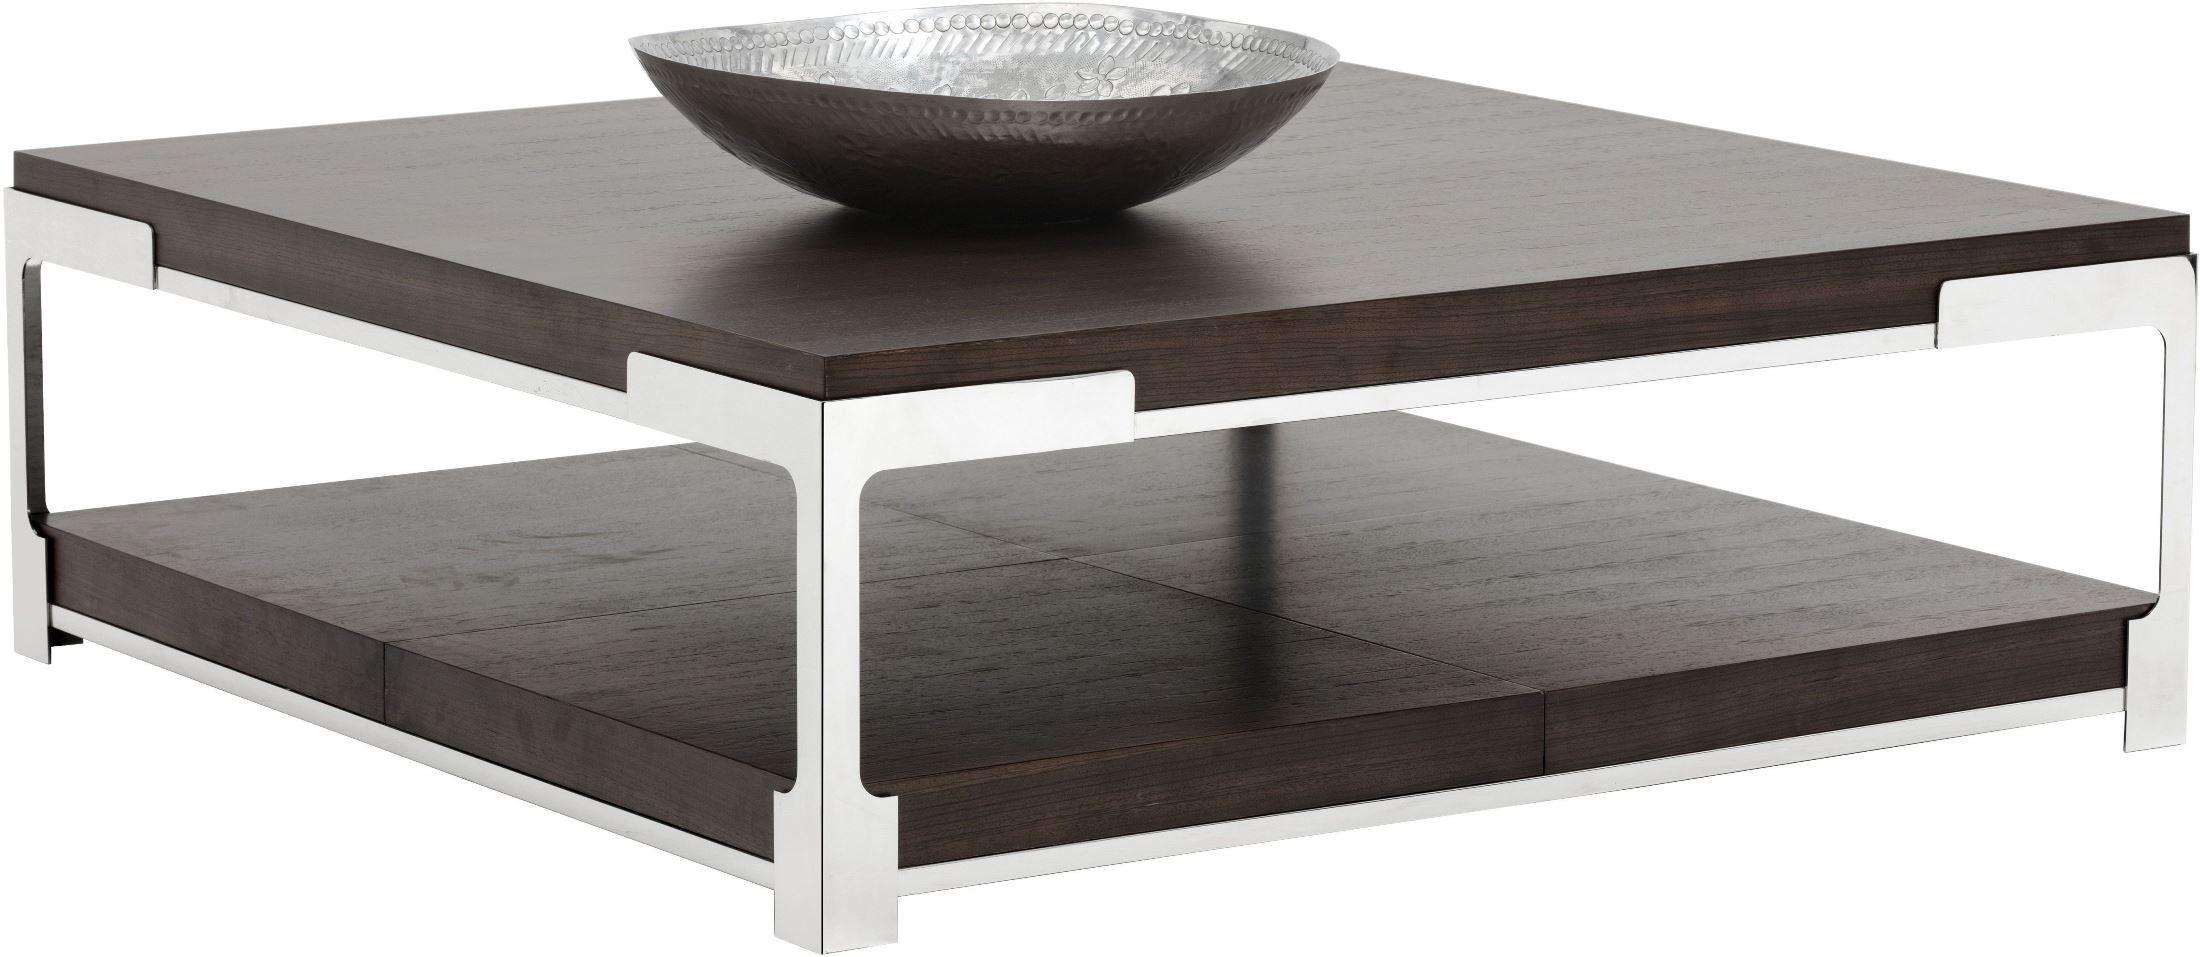 davenport dark zebra square coffee table 101517 sunpan modern home. Black Bedroom Furniture Sets. Home Design Ideas